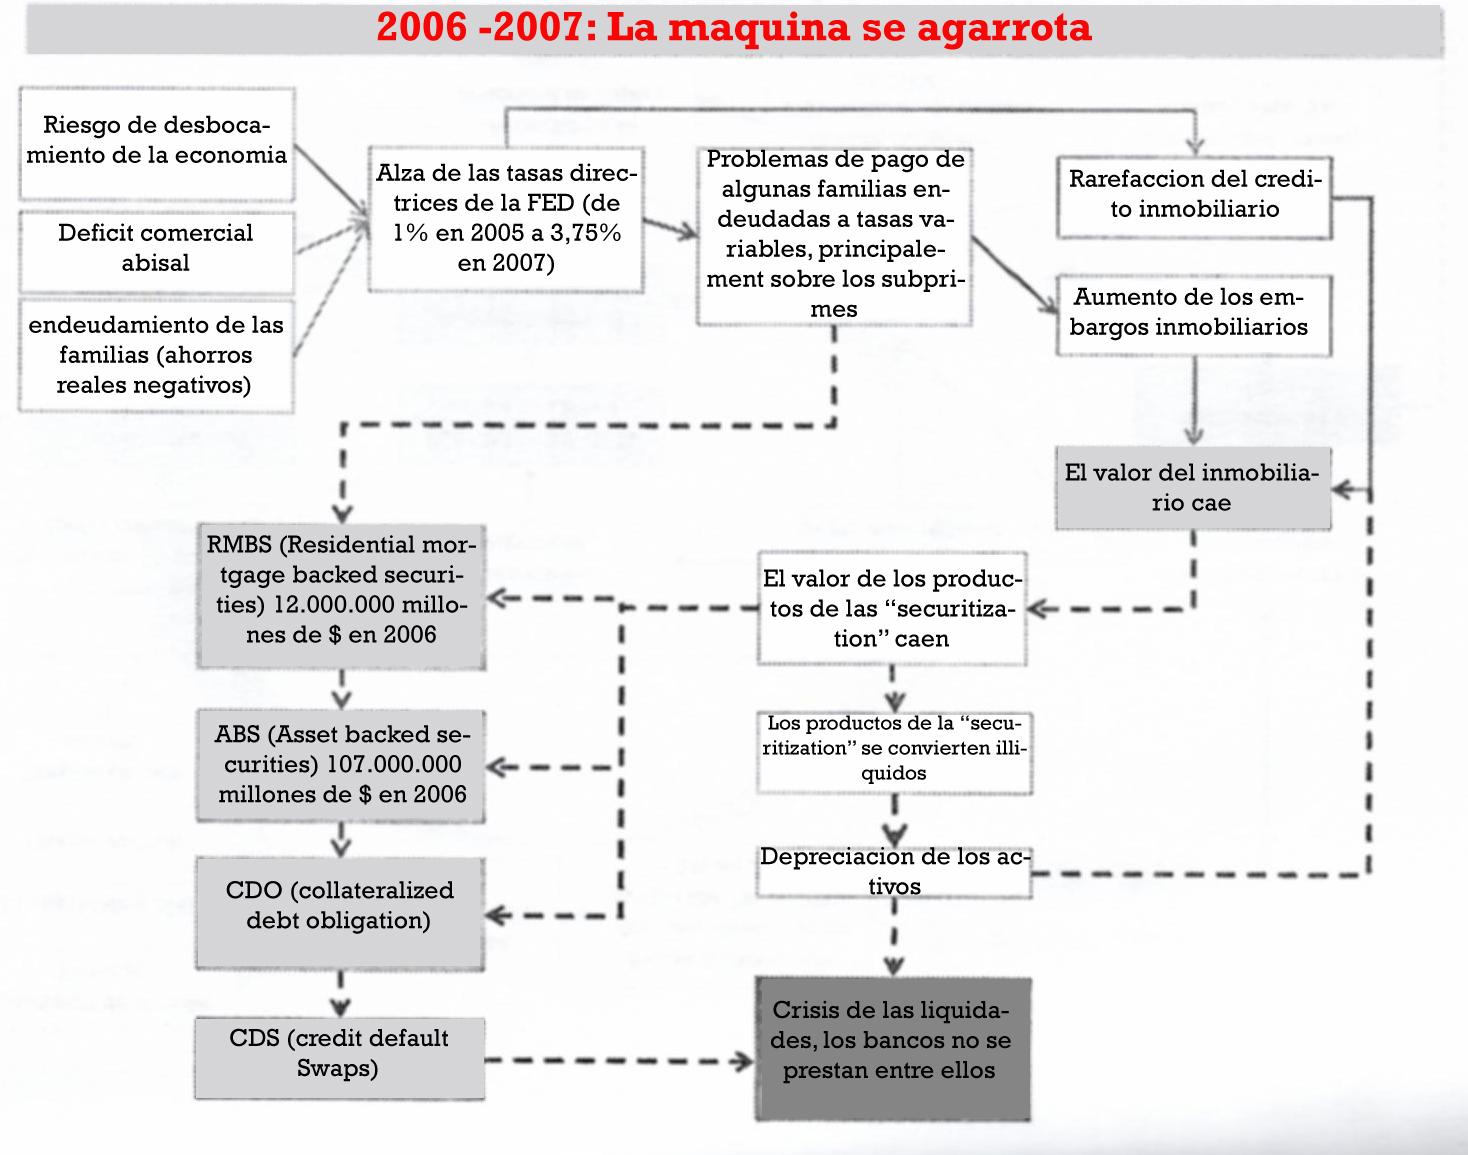 2006-2007-la-maquina-se-agarrota